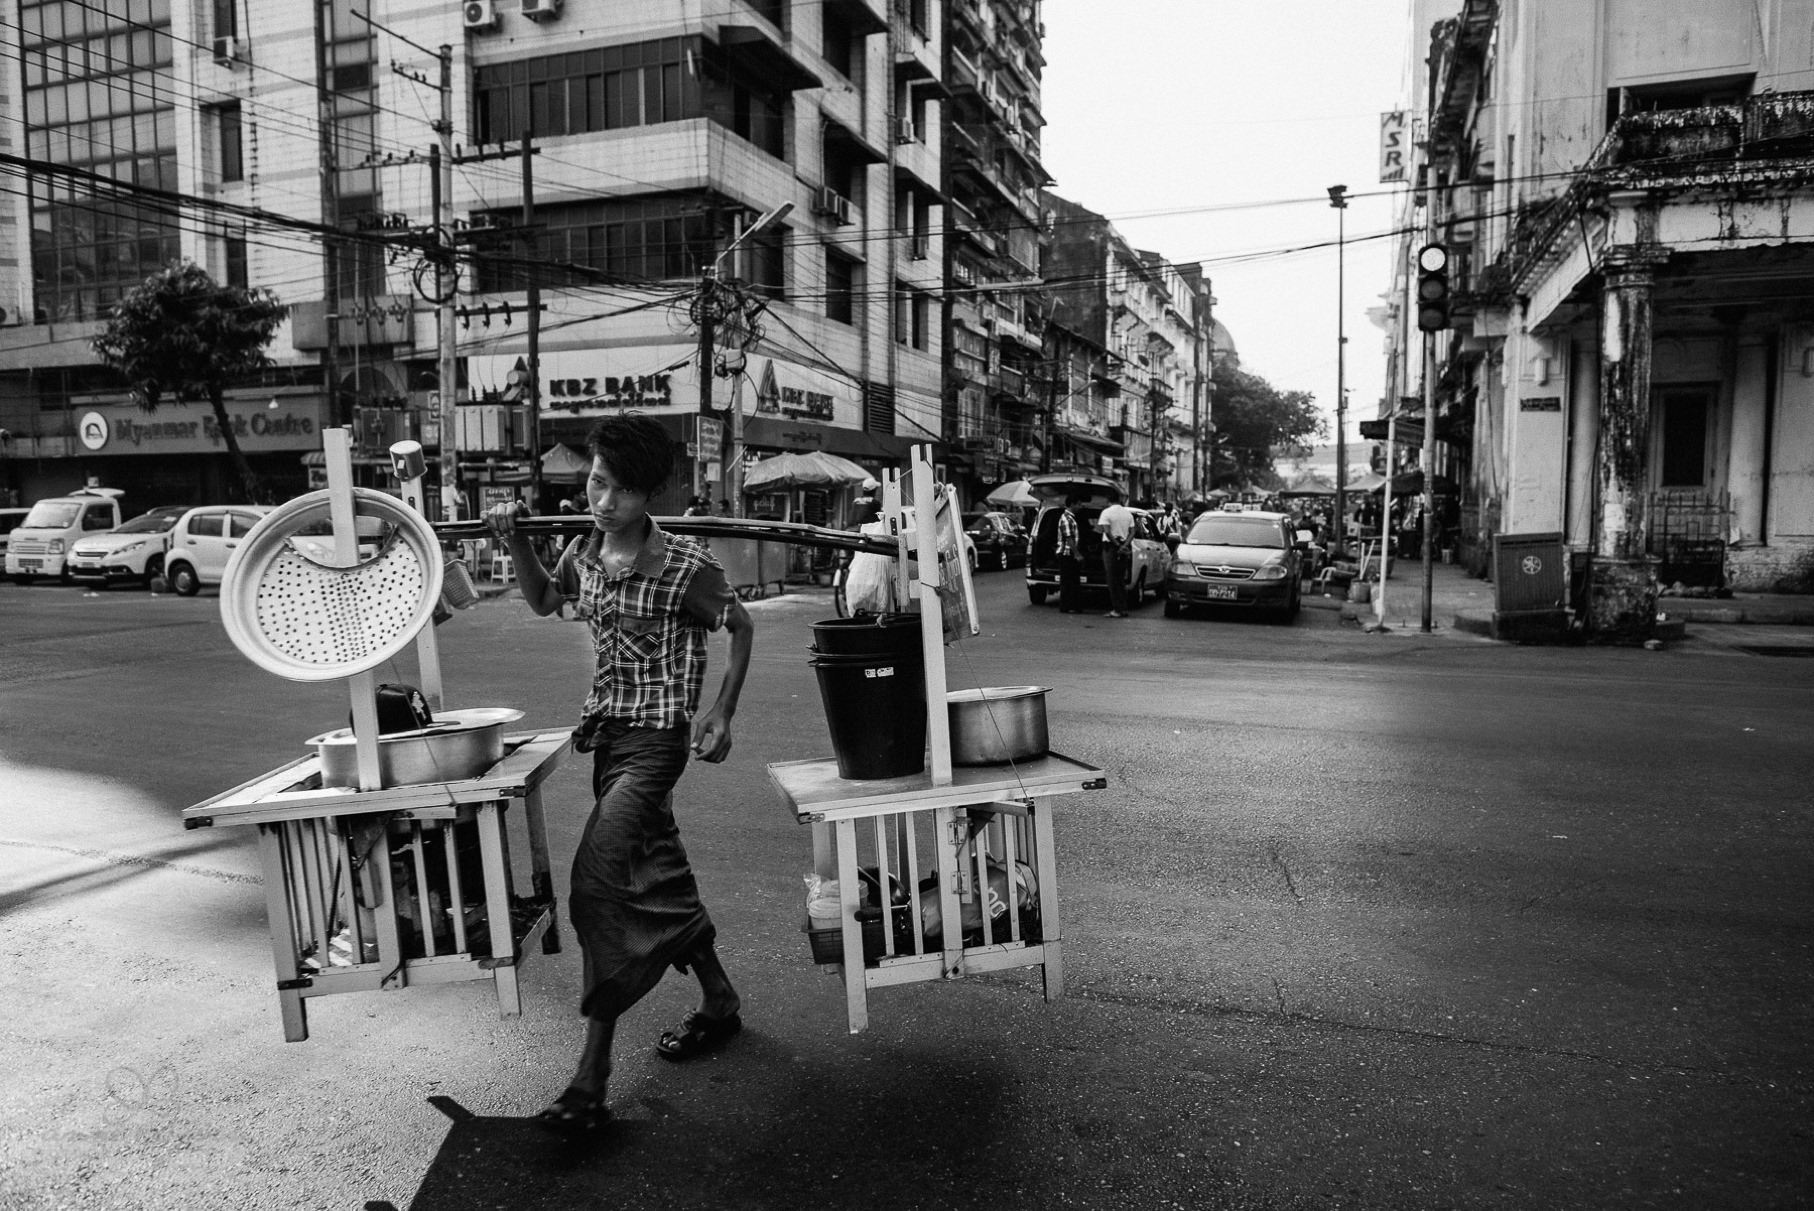 0003 yangon mandalay d76 4202 - Großstädte Myanmars - Yangon & Mandalay